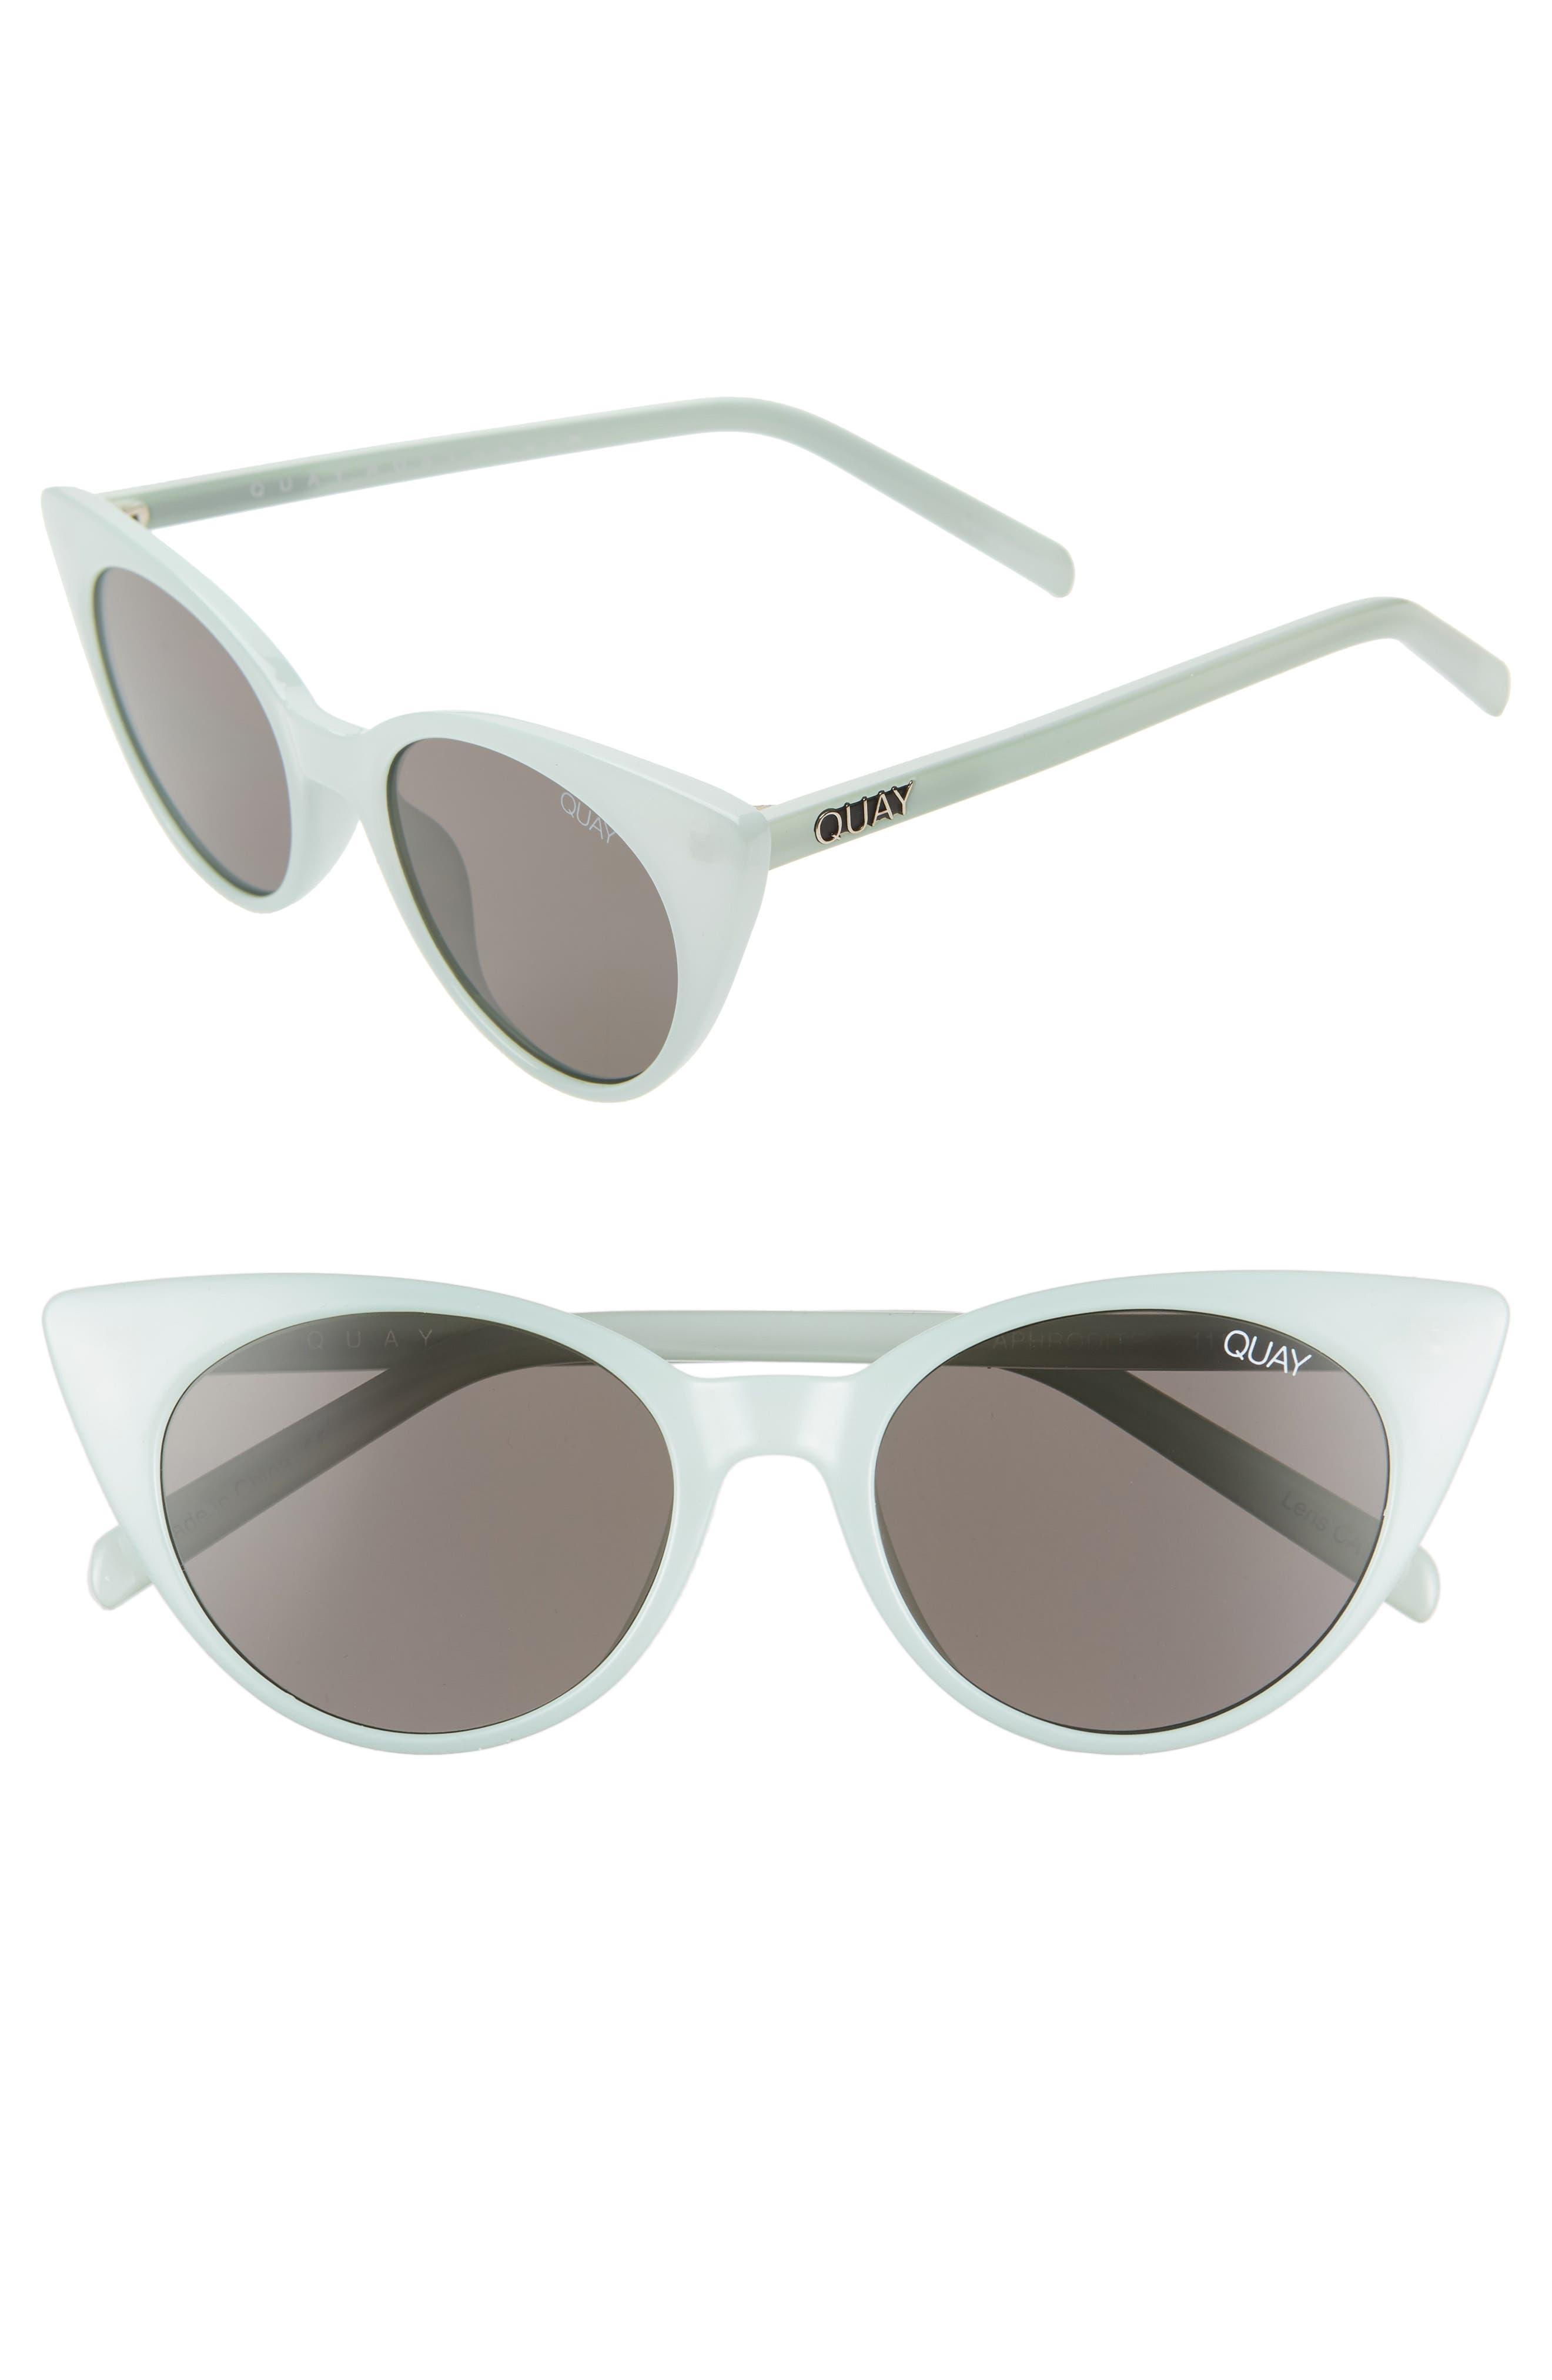 Quay Australia Aphrodite 5m Cat Eye Sunglasses - Mint/ Smoke